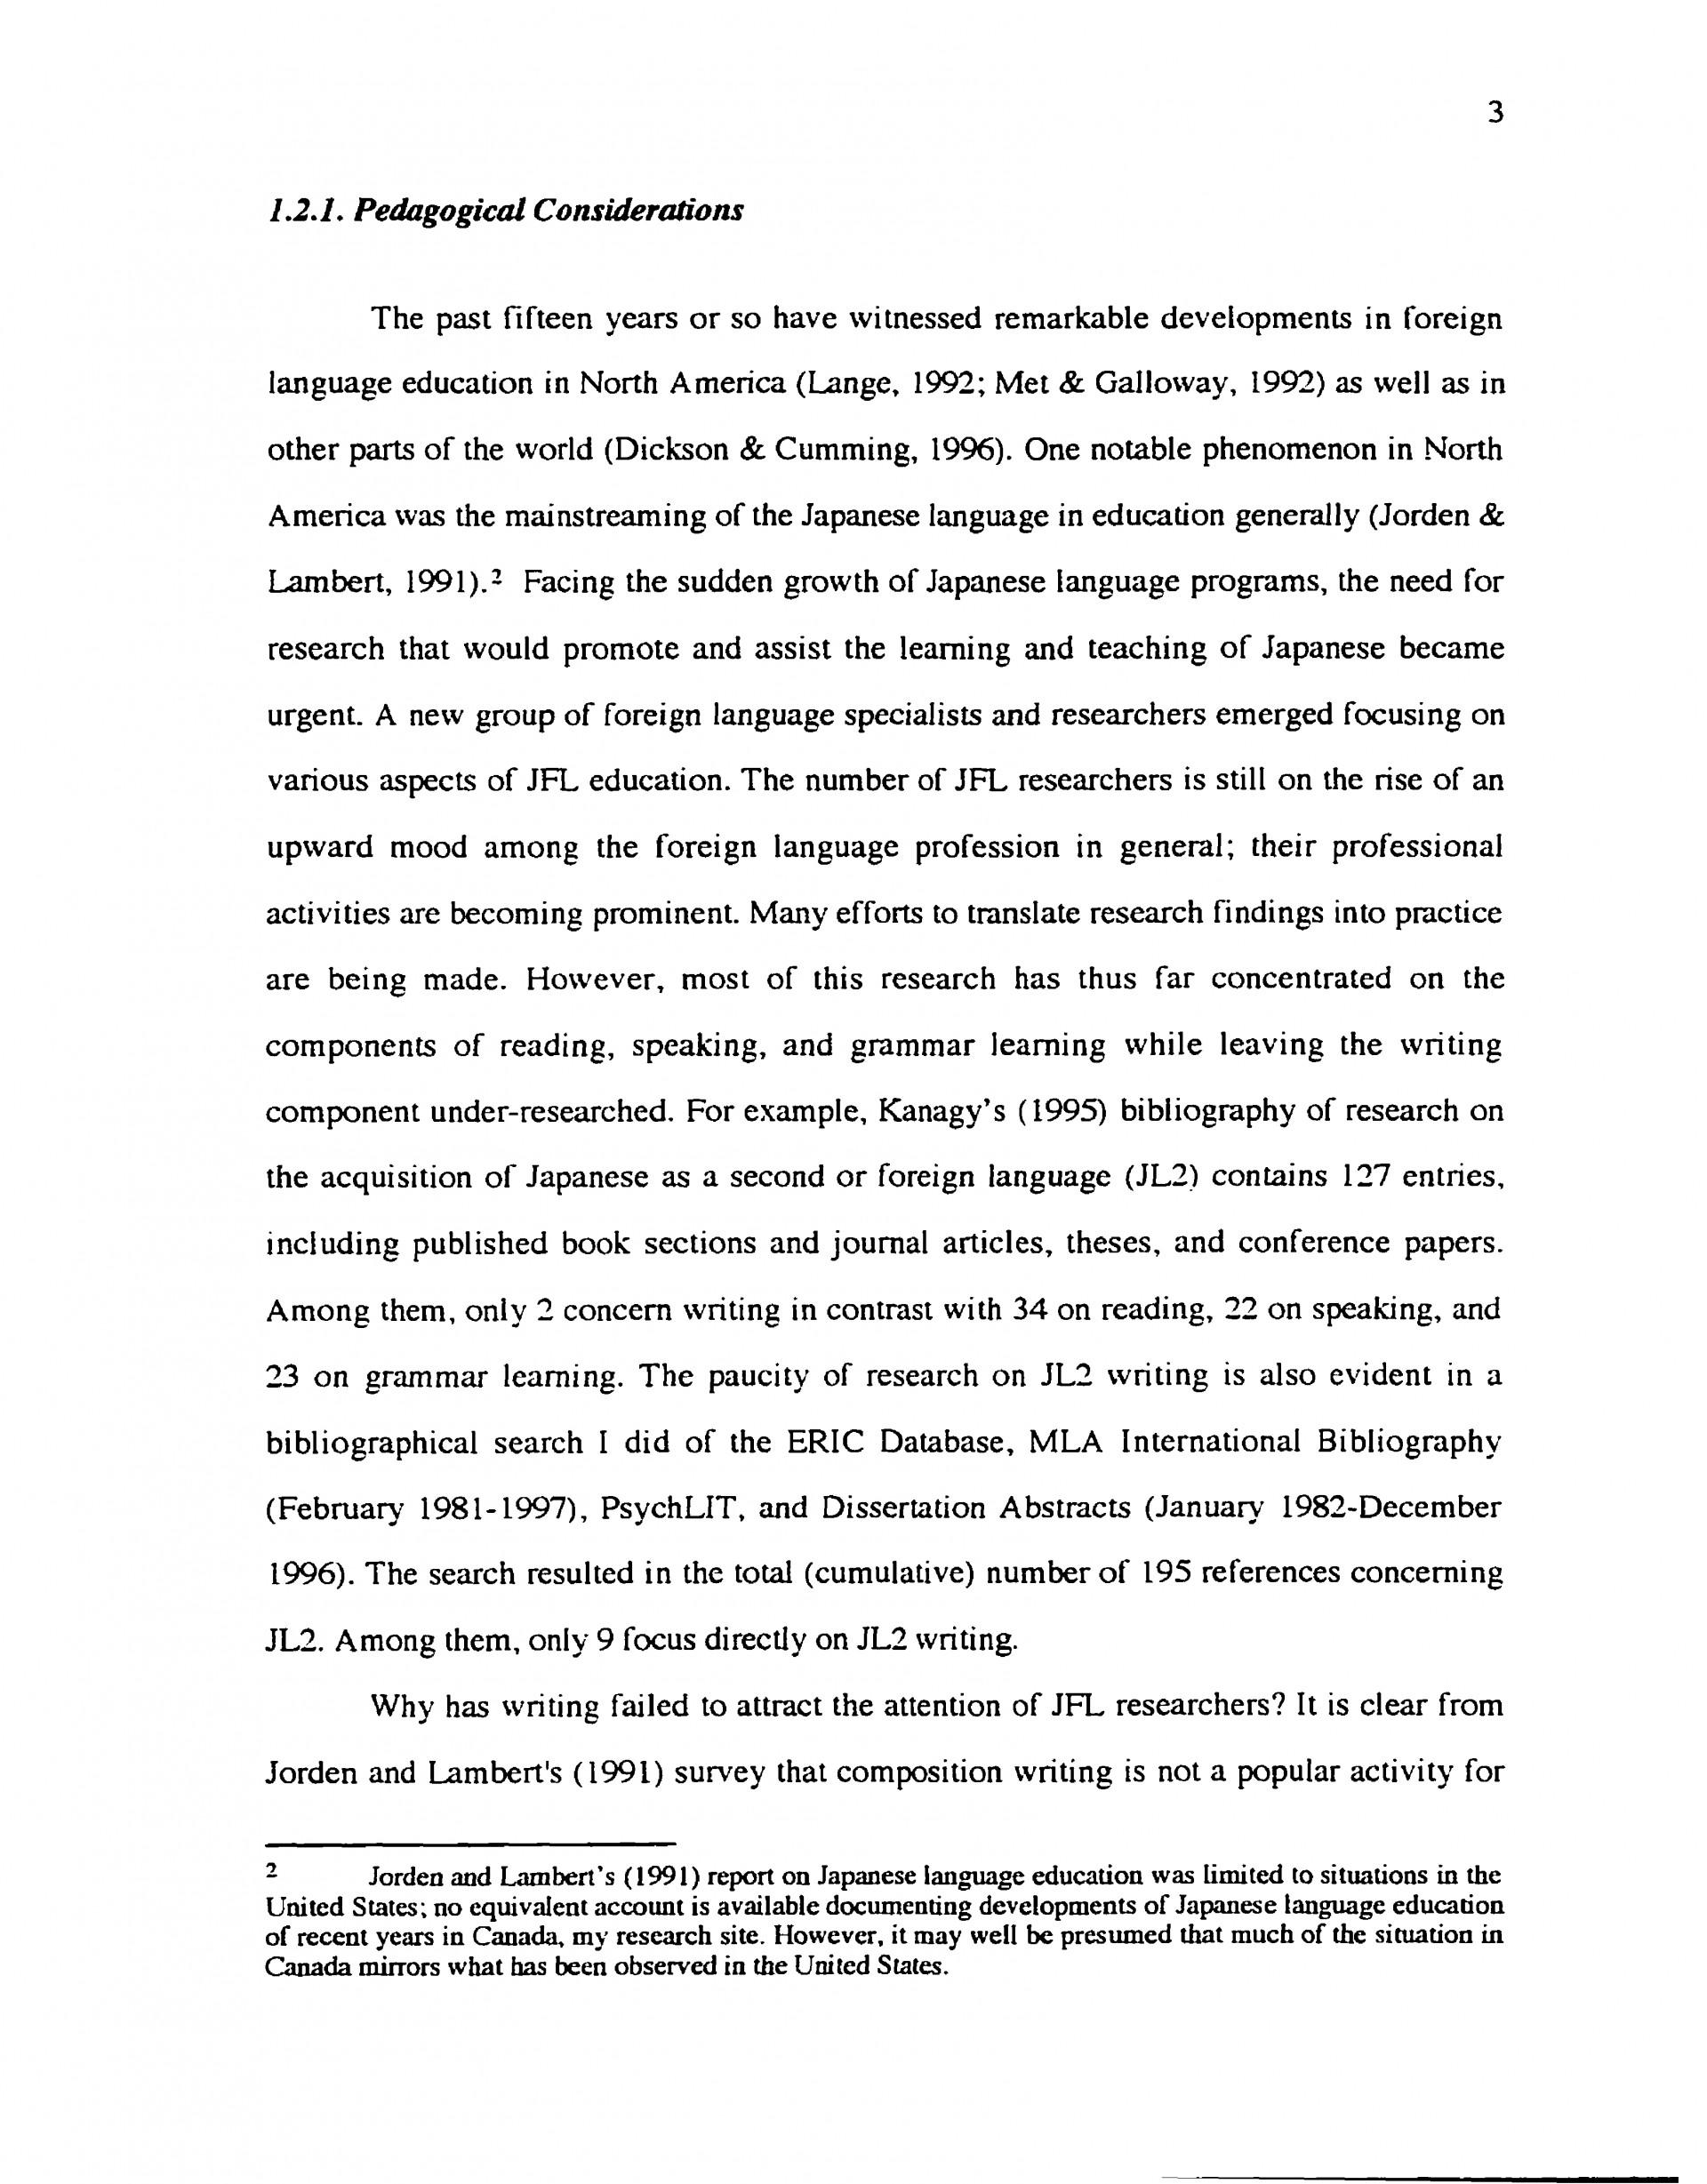 012 Python List Assignment Last Index Of Element Black Lives Matter Persuasive Essay Example Impressive Thesis 1920